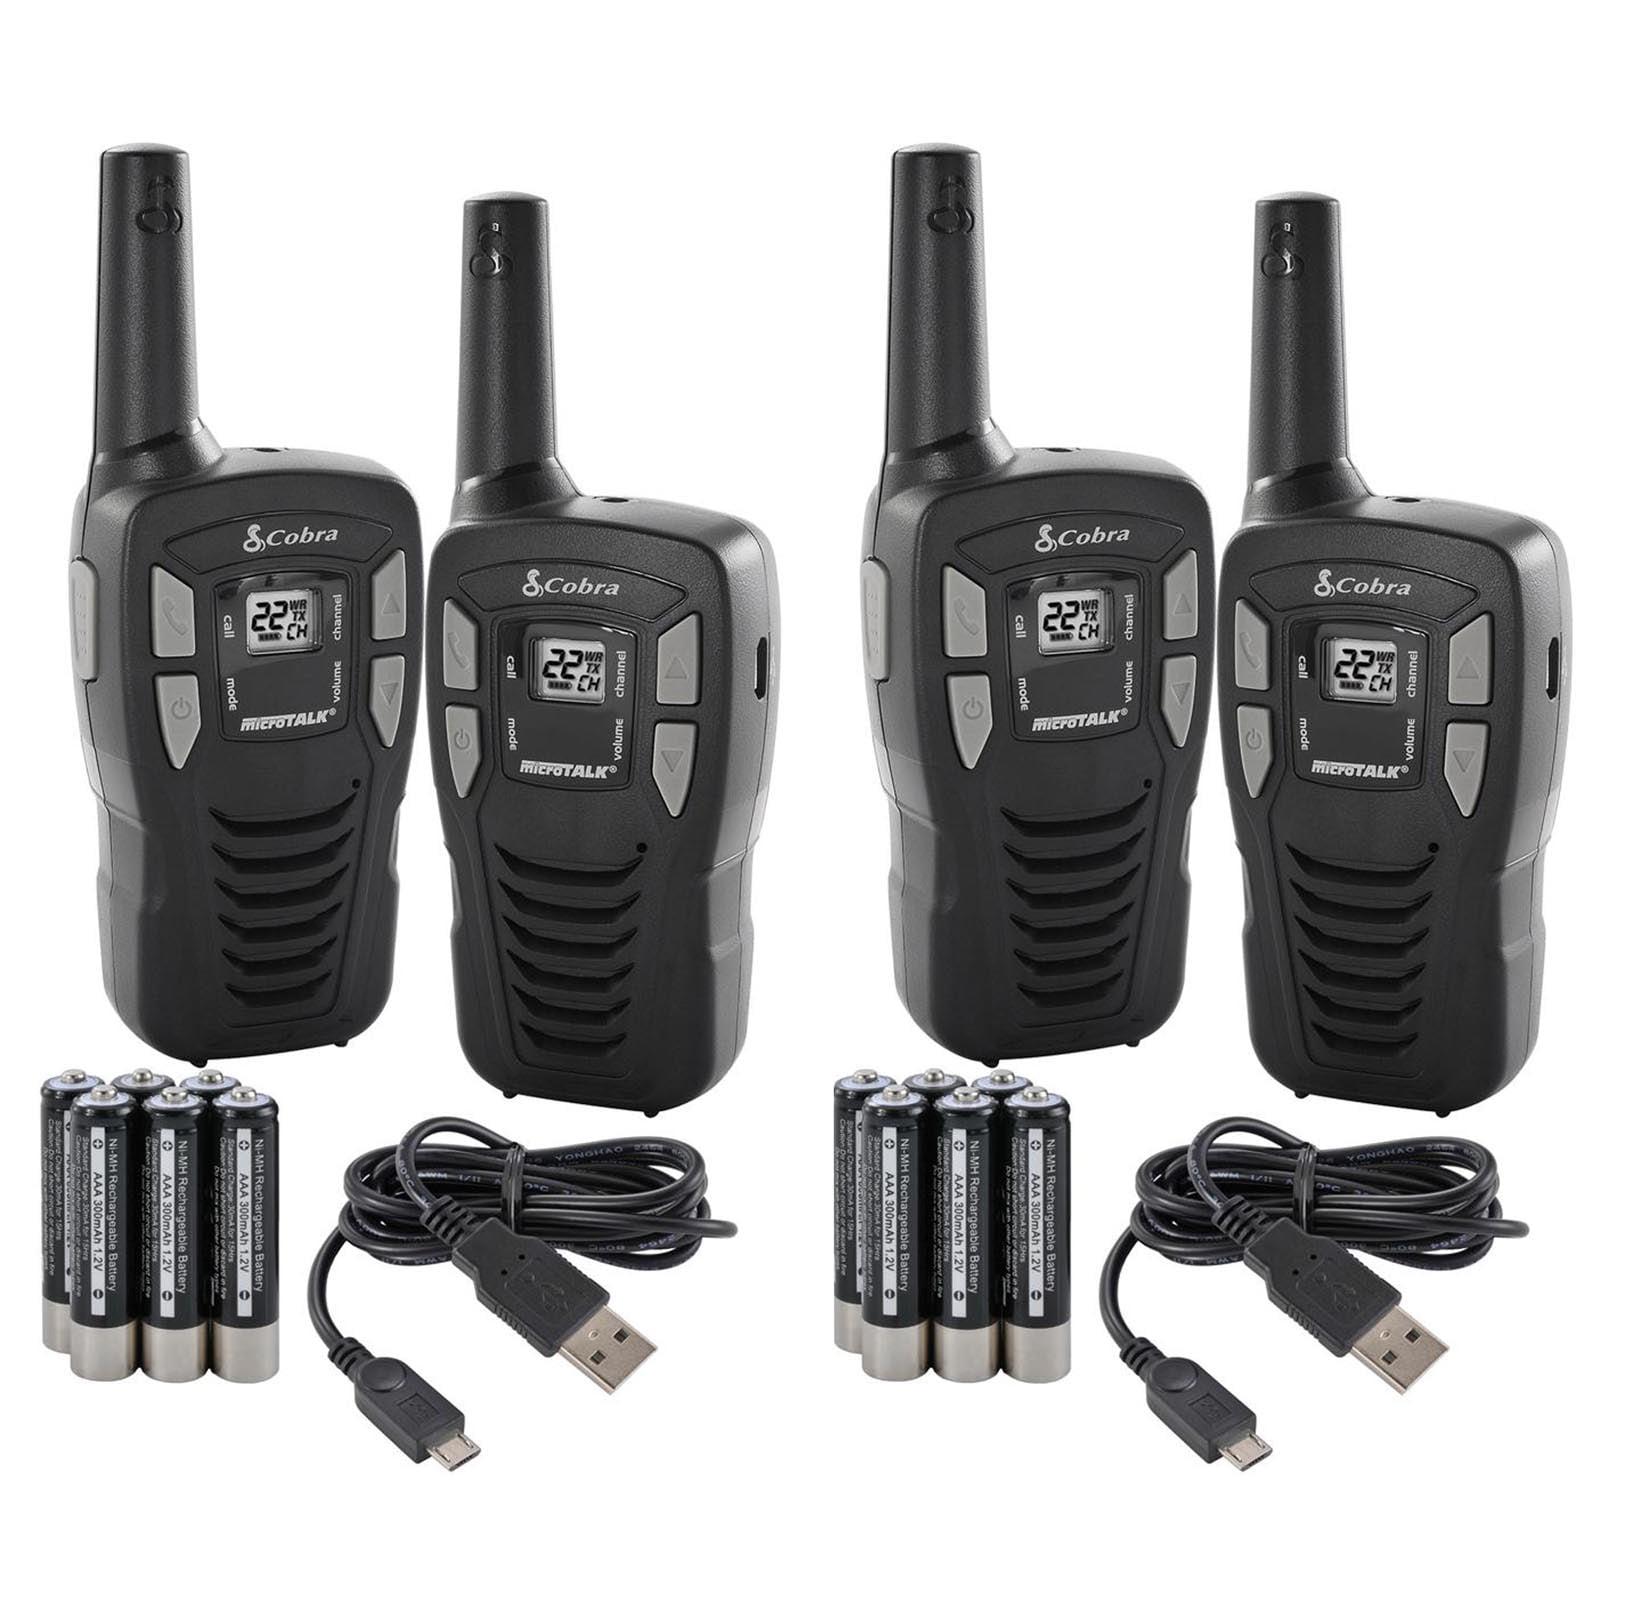 New! (4) COBRA CXT145 MicroTalk 16 Mile 22 Channel Walkie Talkie 2 Way Radios by Cobra